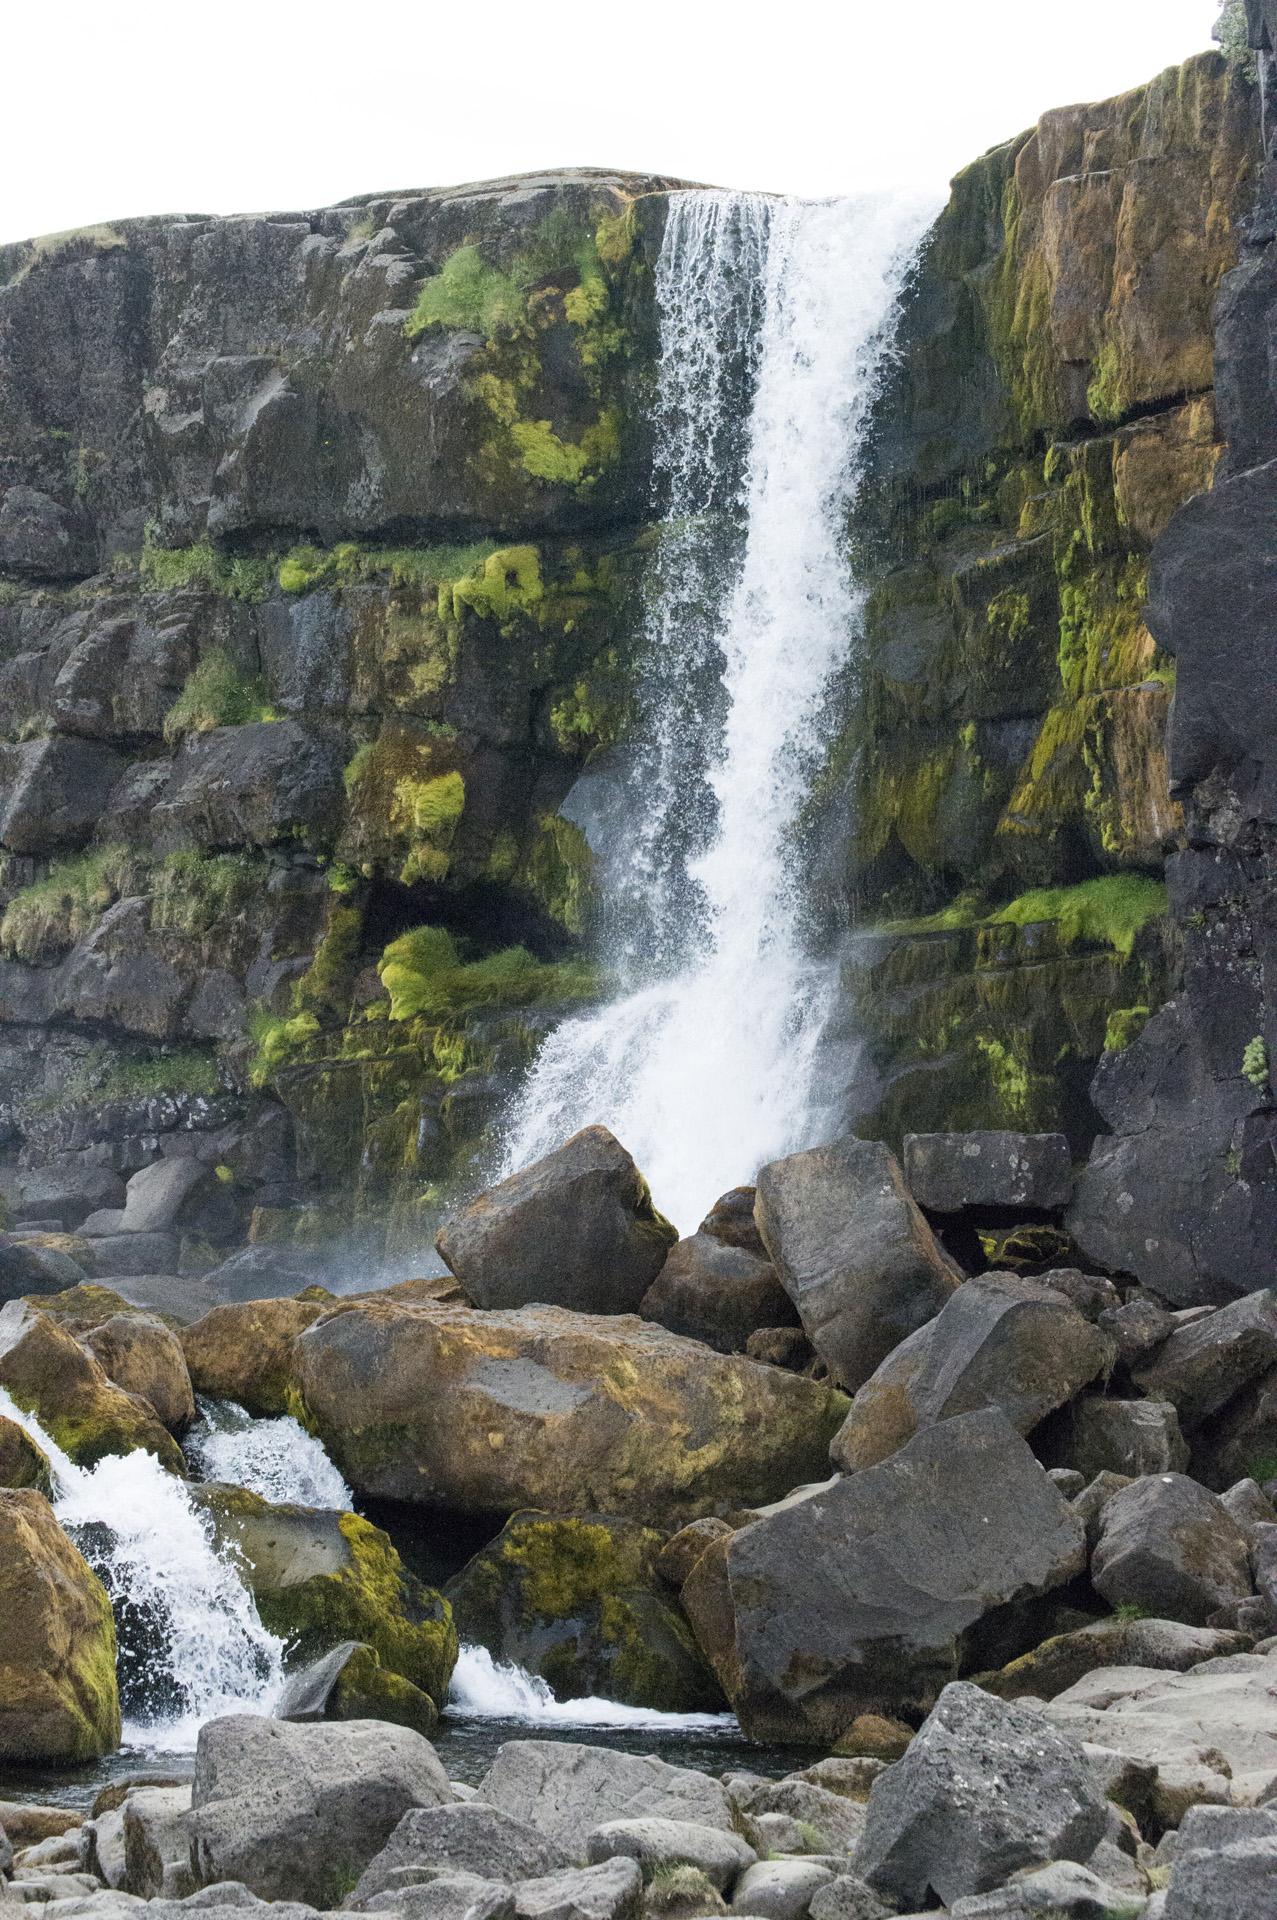 Öxarárfoss waterfall flows into the Mid-Atlantic Ridge rift valley at Þingvellir National Park, Suðurland region, Iceland.